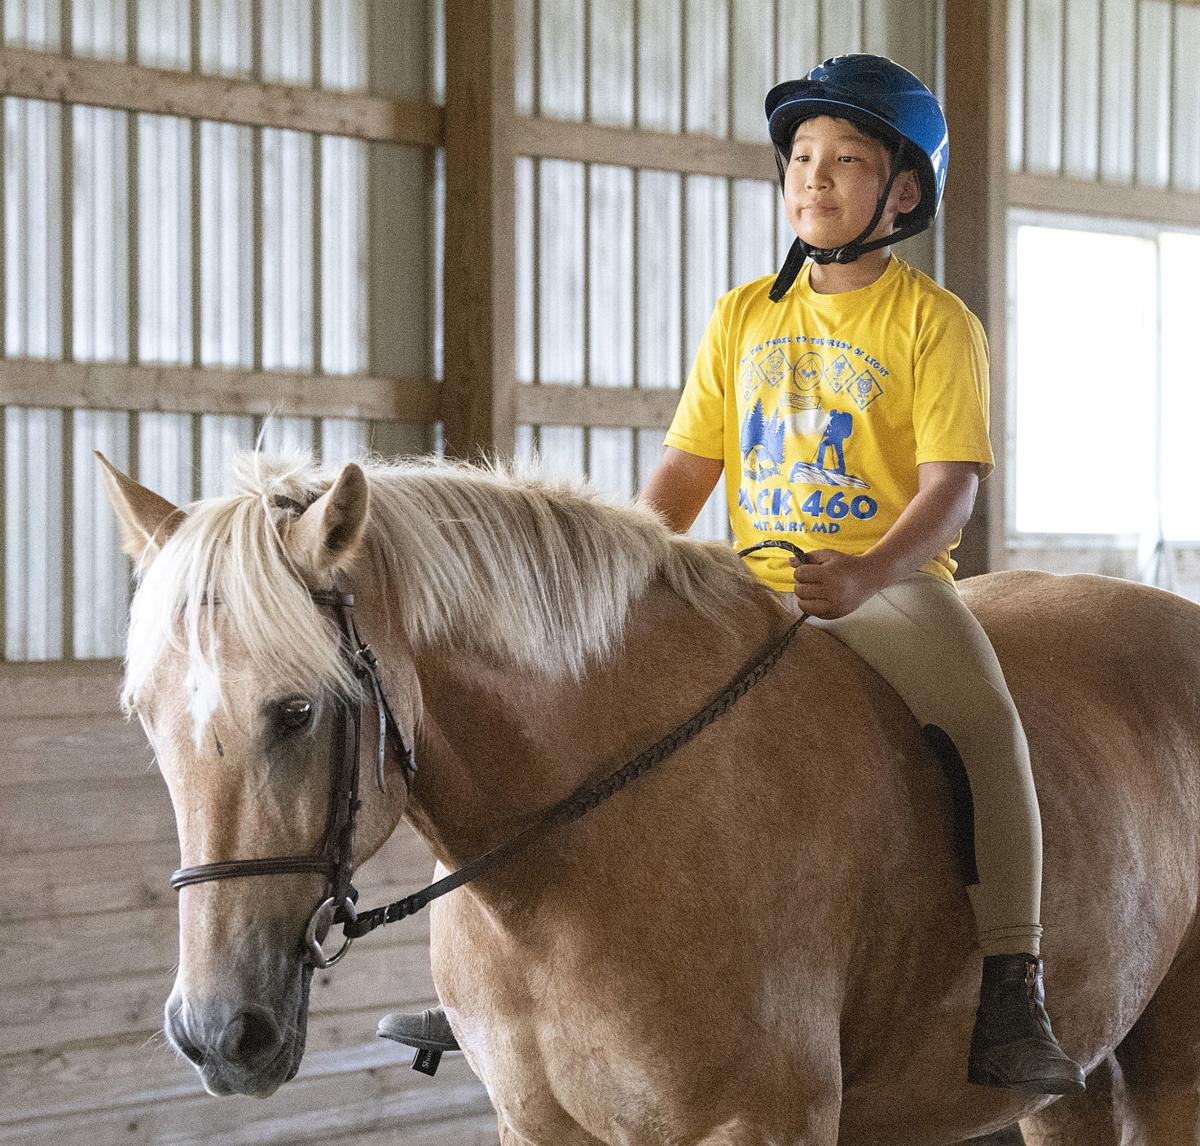 Talbolt Run Horse Farm